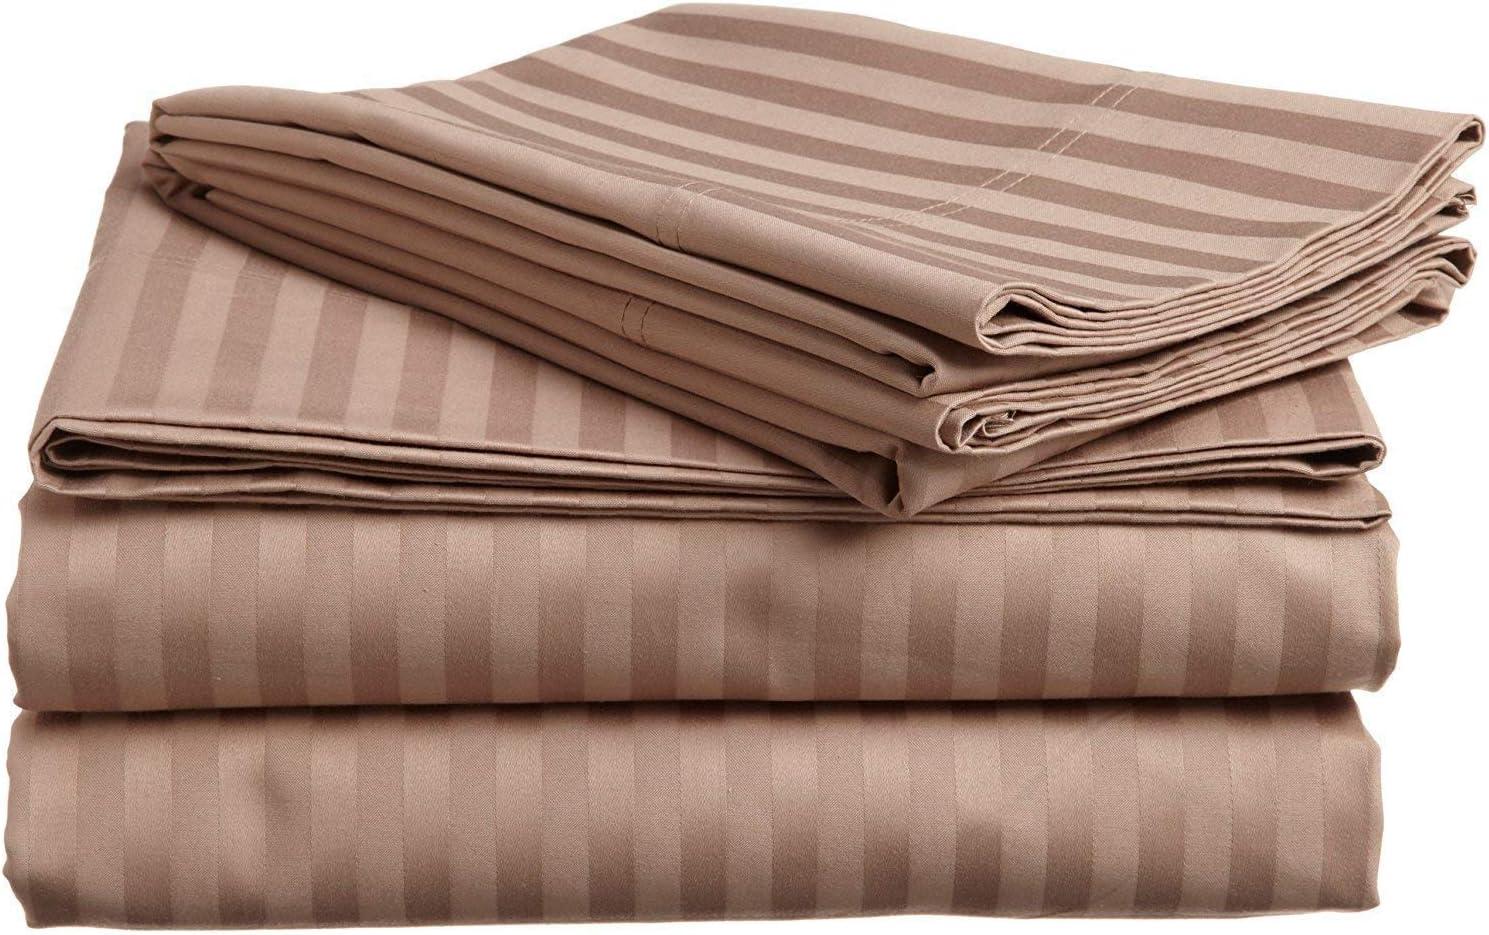 Hotel Luxury Certified shopping 100% Cotton { 6-PCs Our shop most popular Set } 1800-TC Sheet